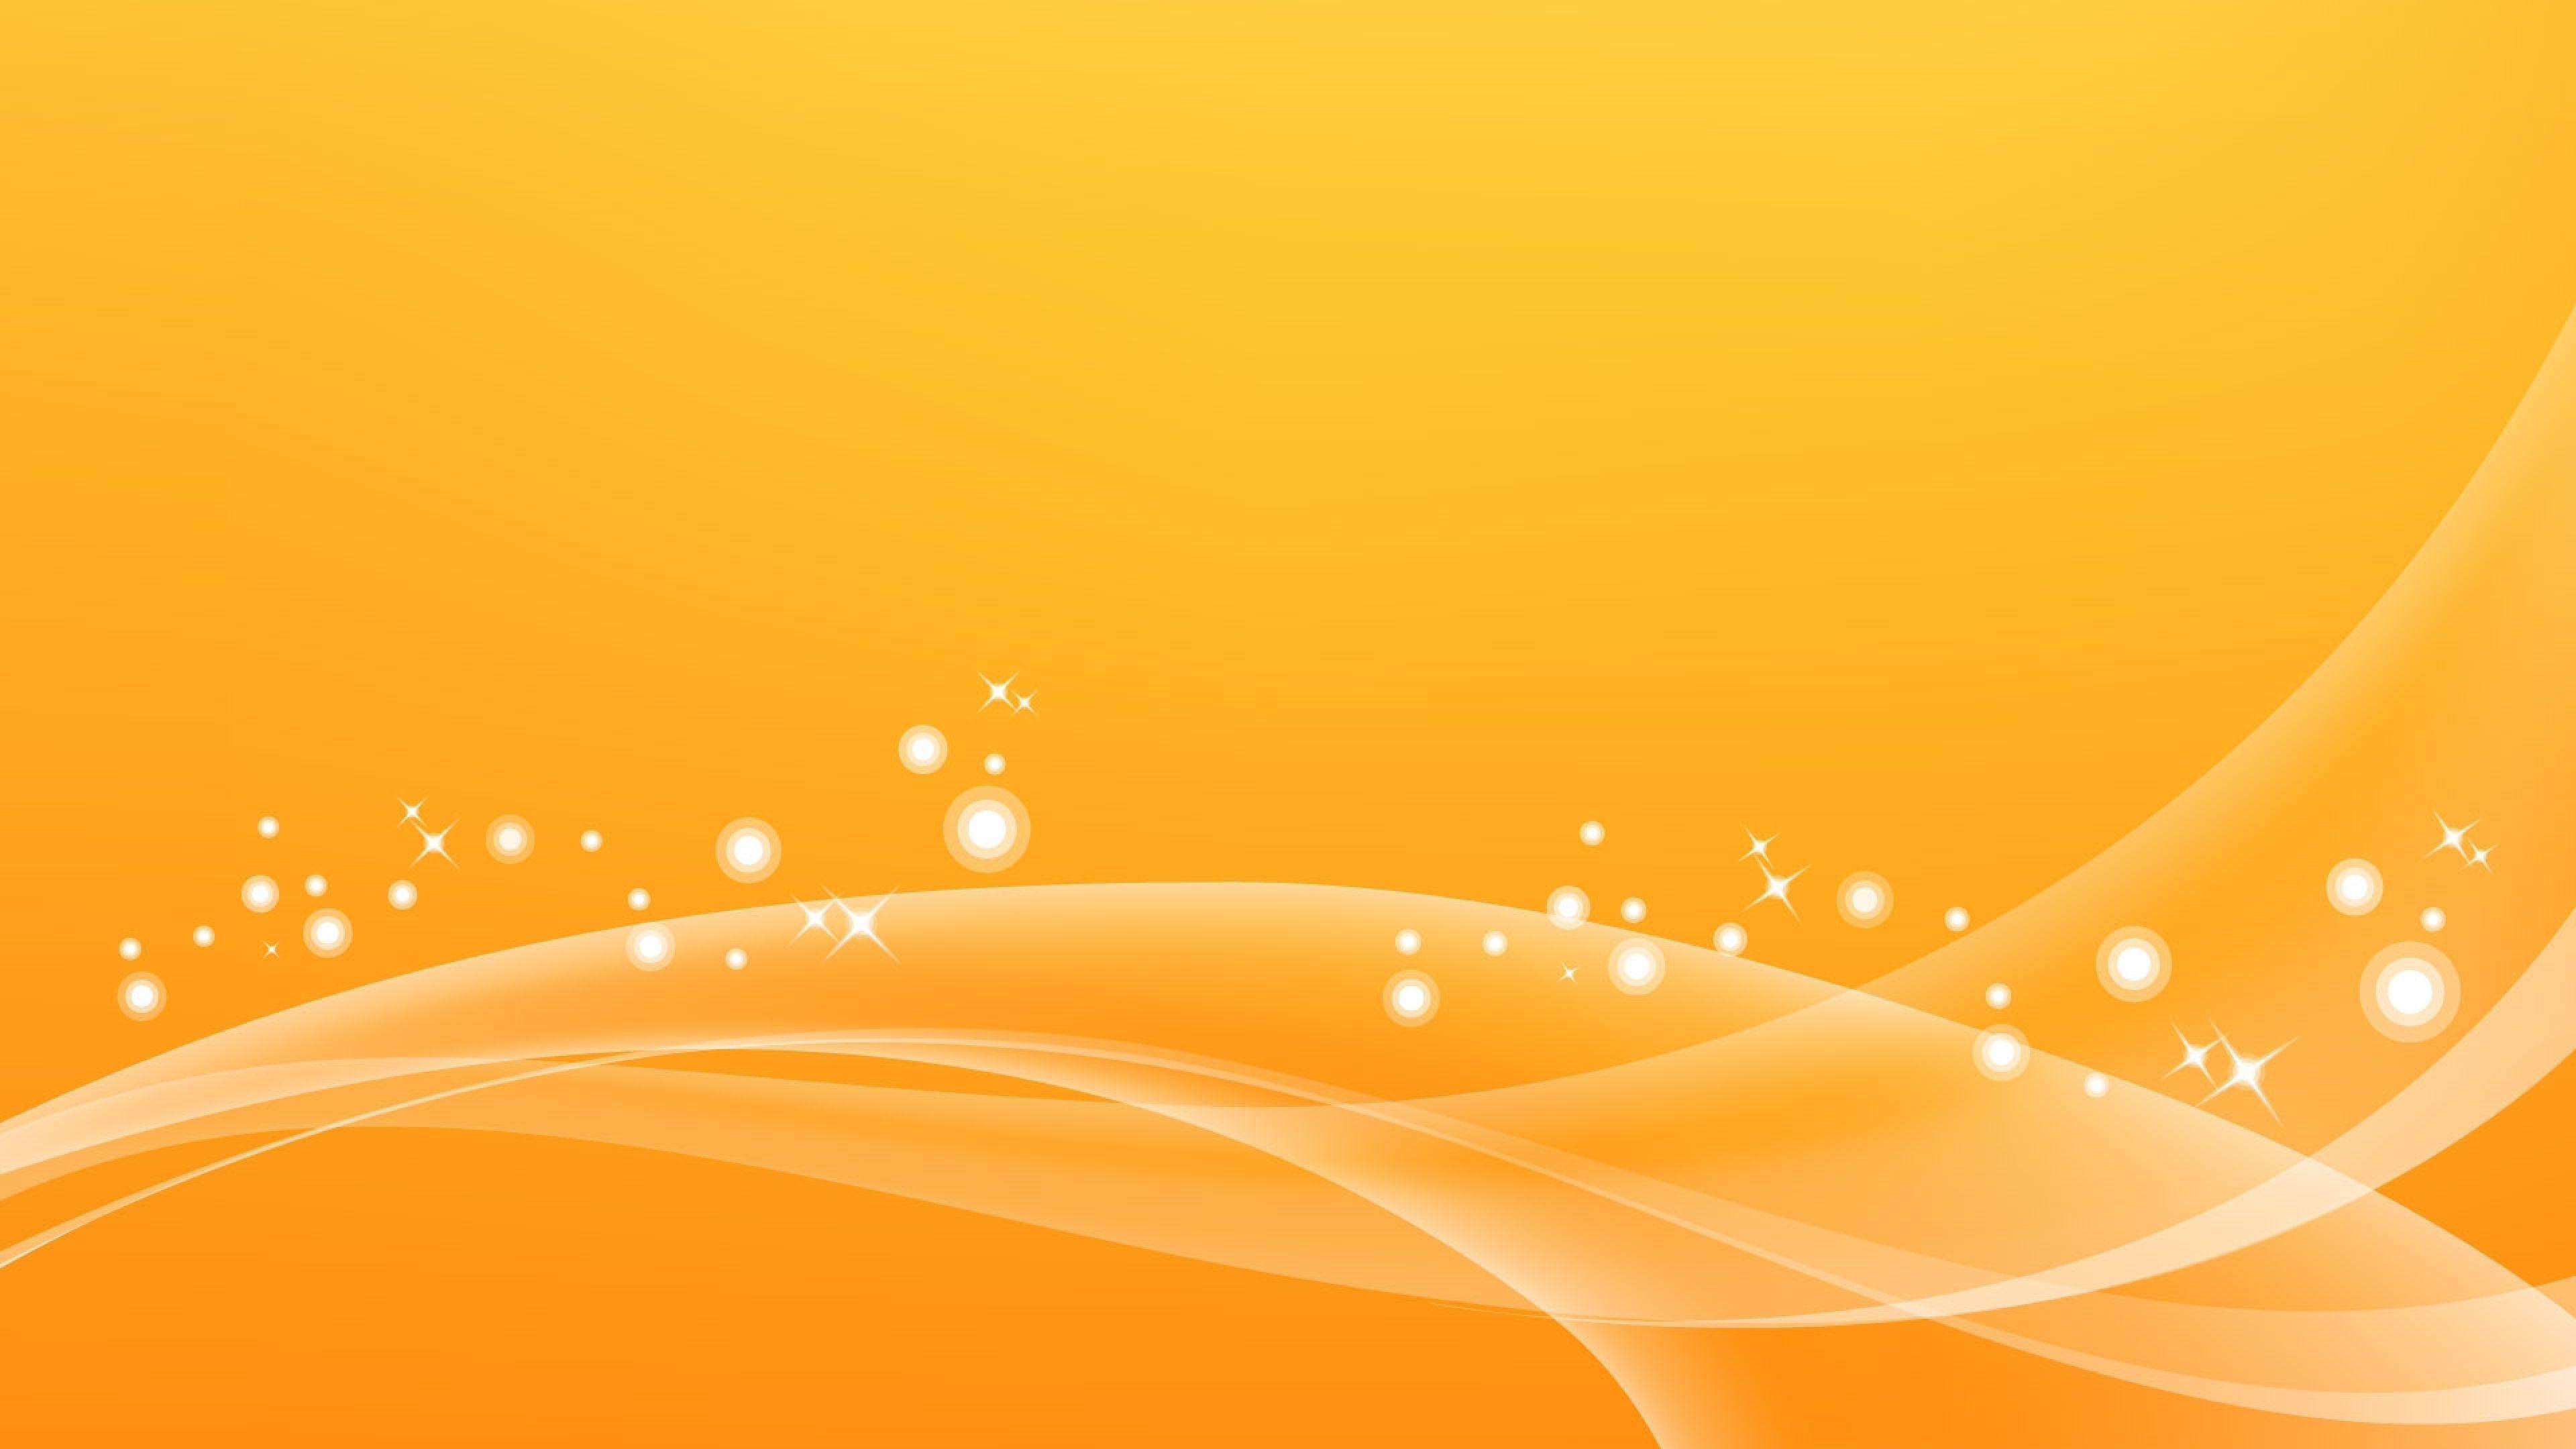 Download Wallpaper 3840x2160 Line Shine Light Abstraction 4k